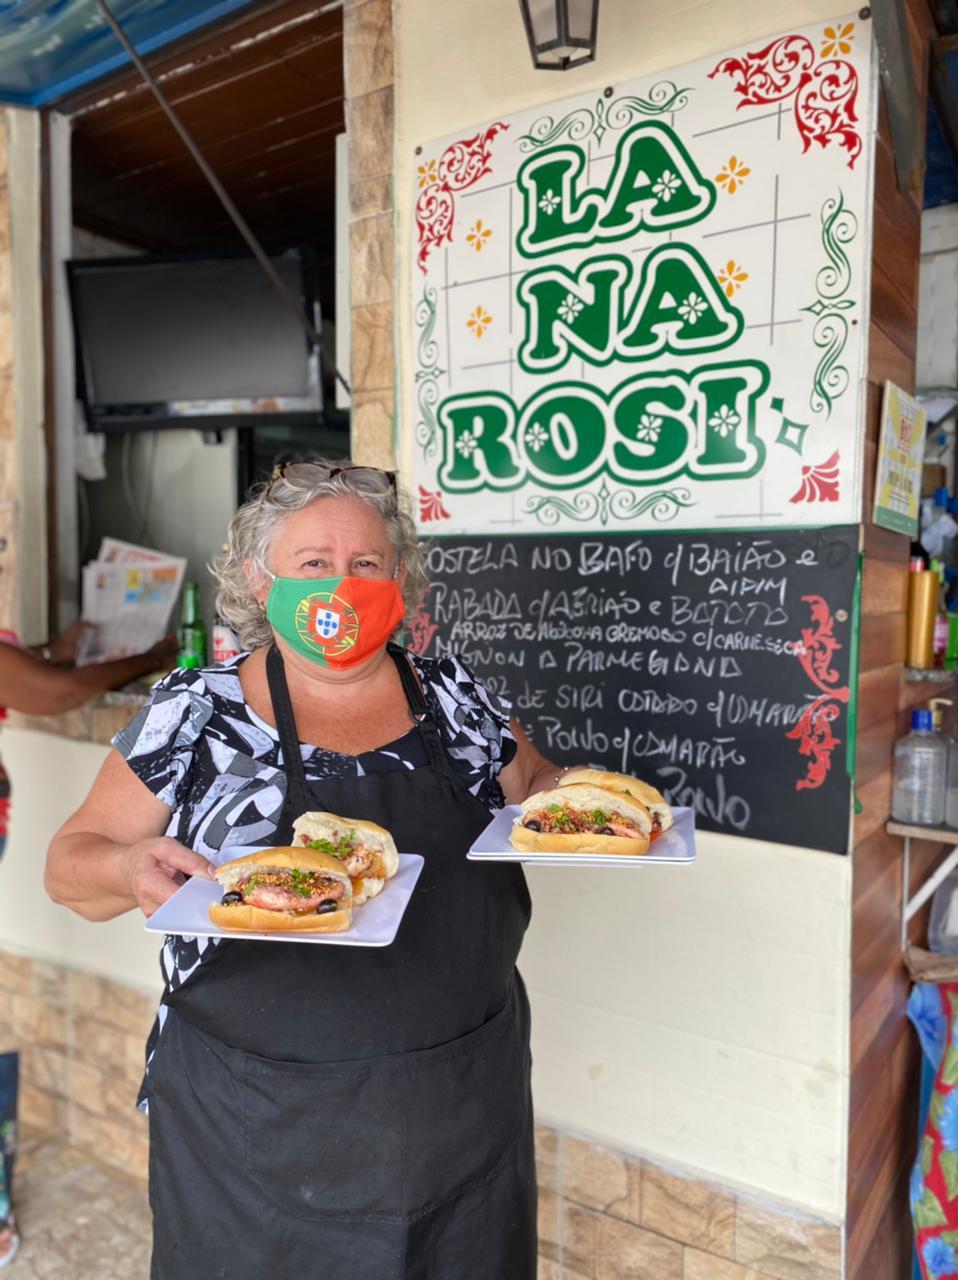 Rosi e seu hot dog de polvo: coisa de louco no quiosque da beira do mangue